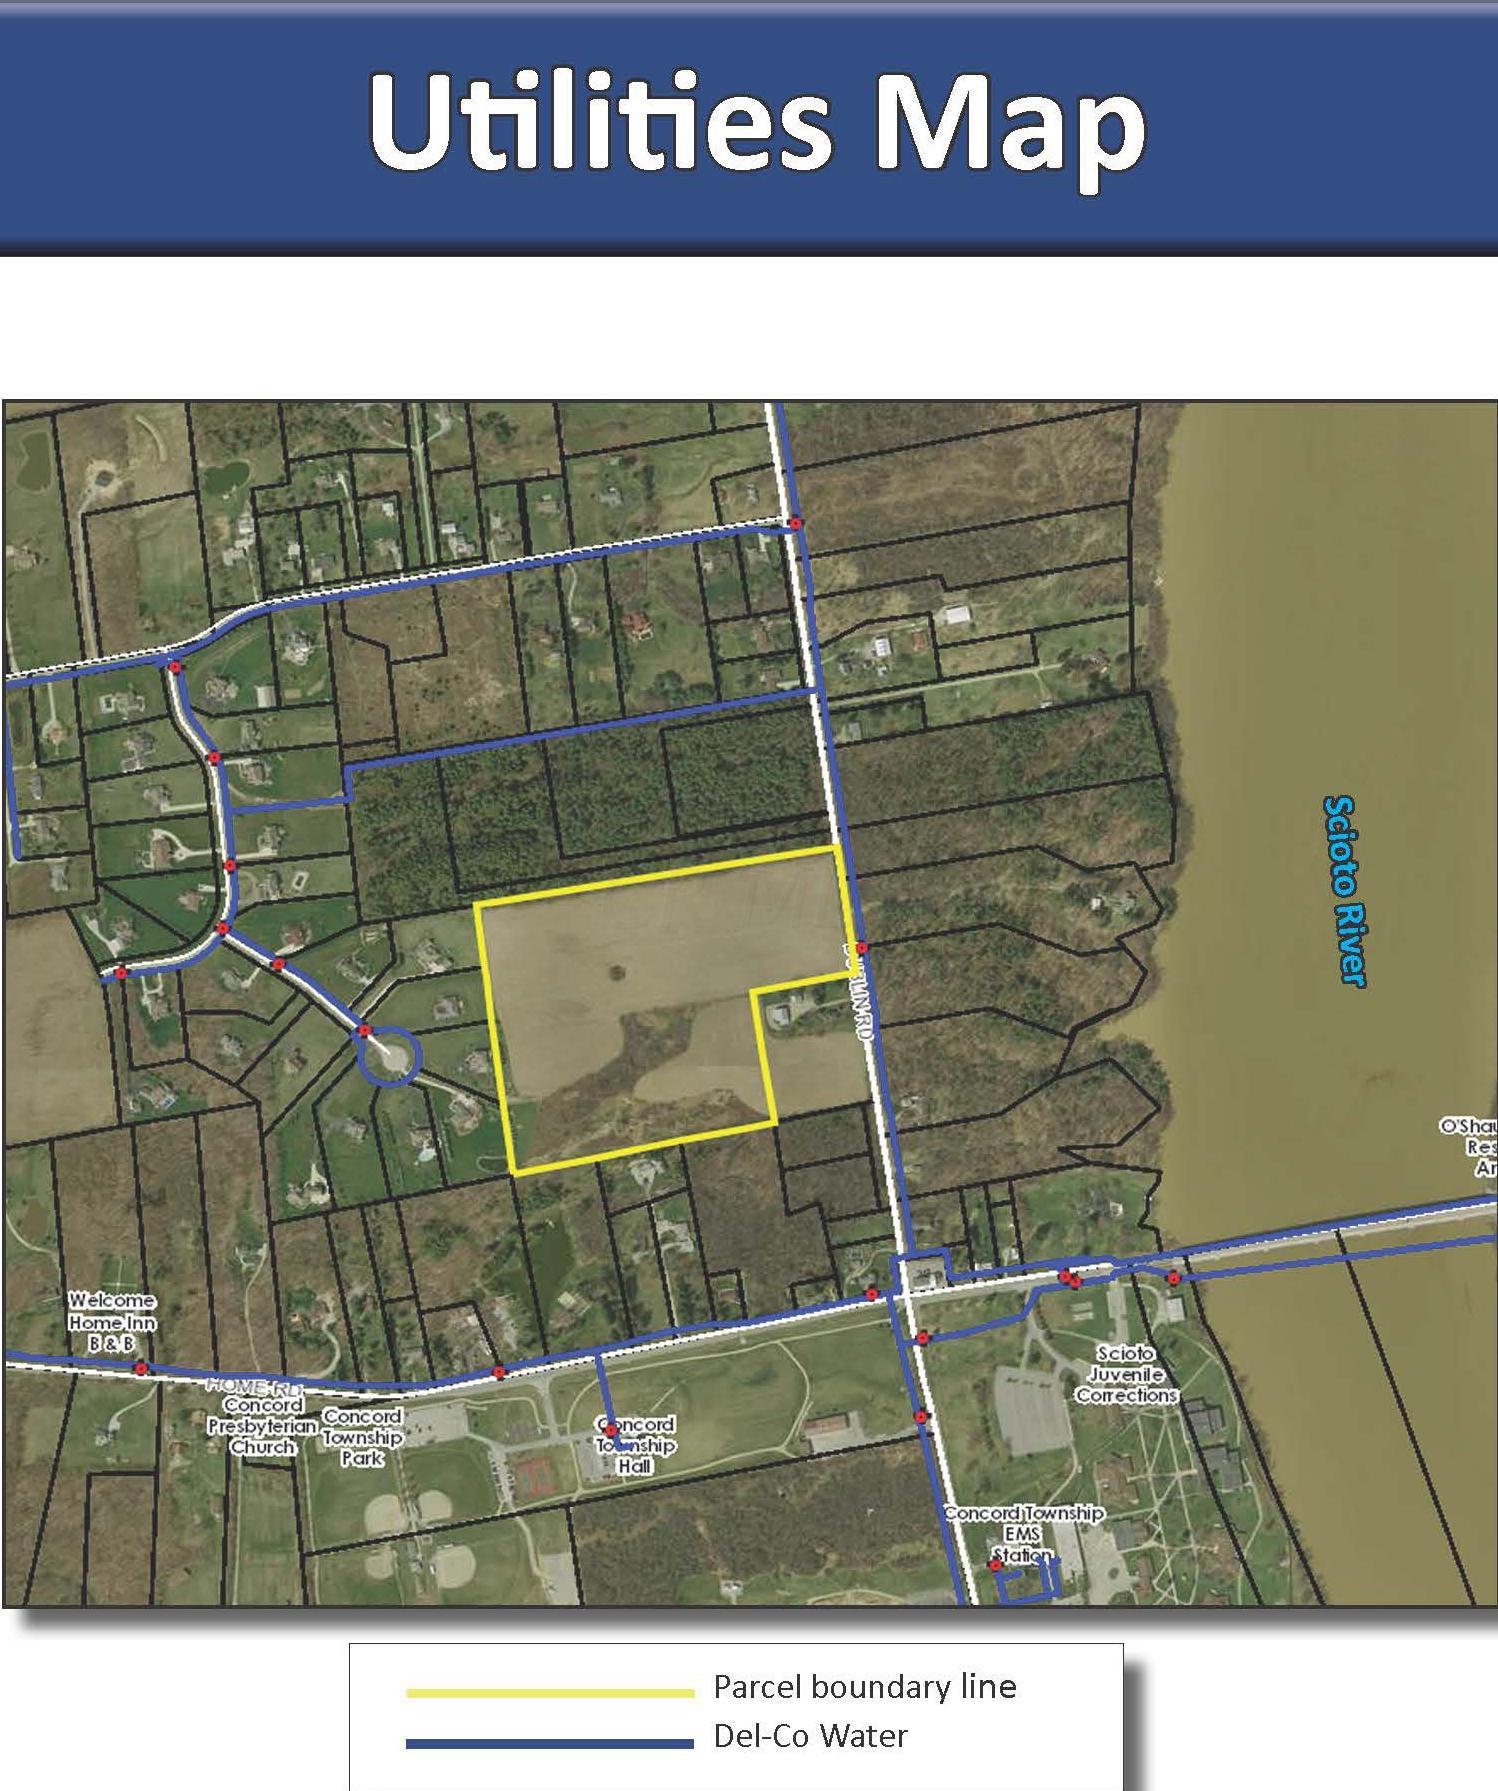 Utilities Map